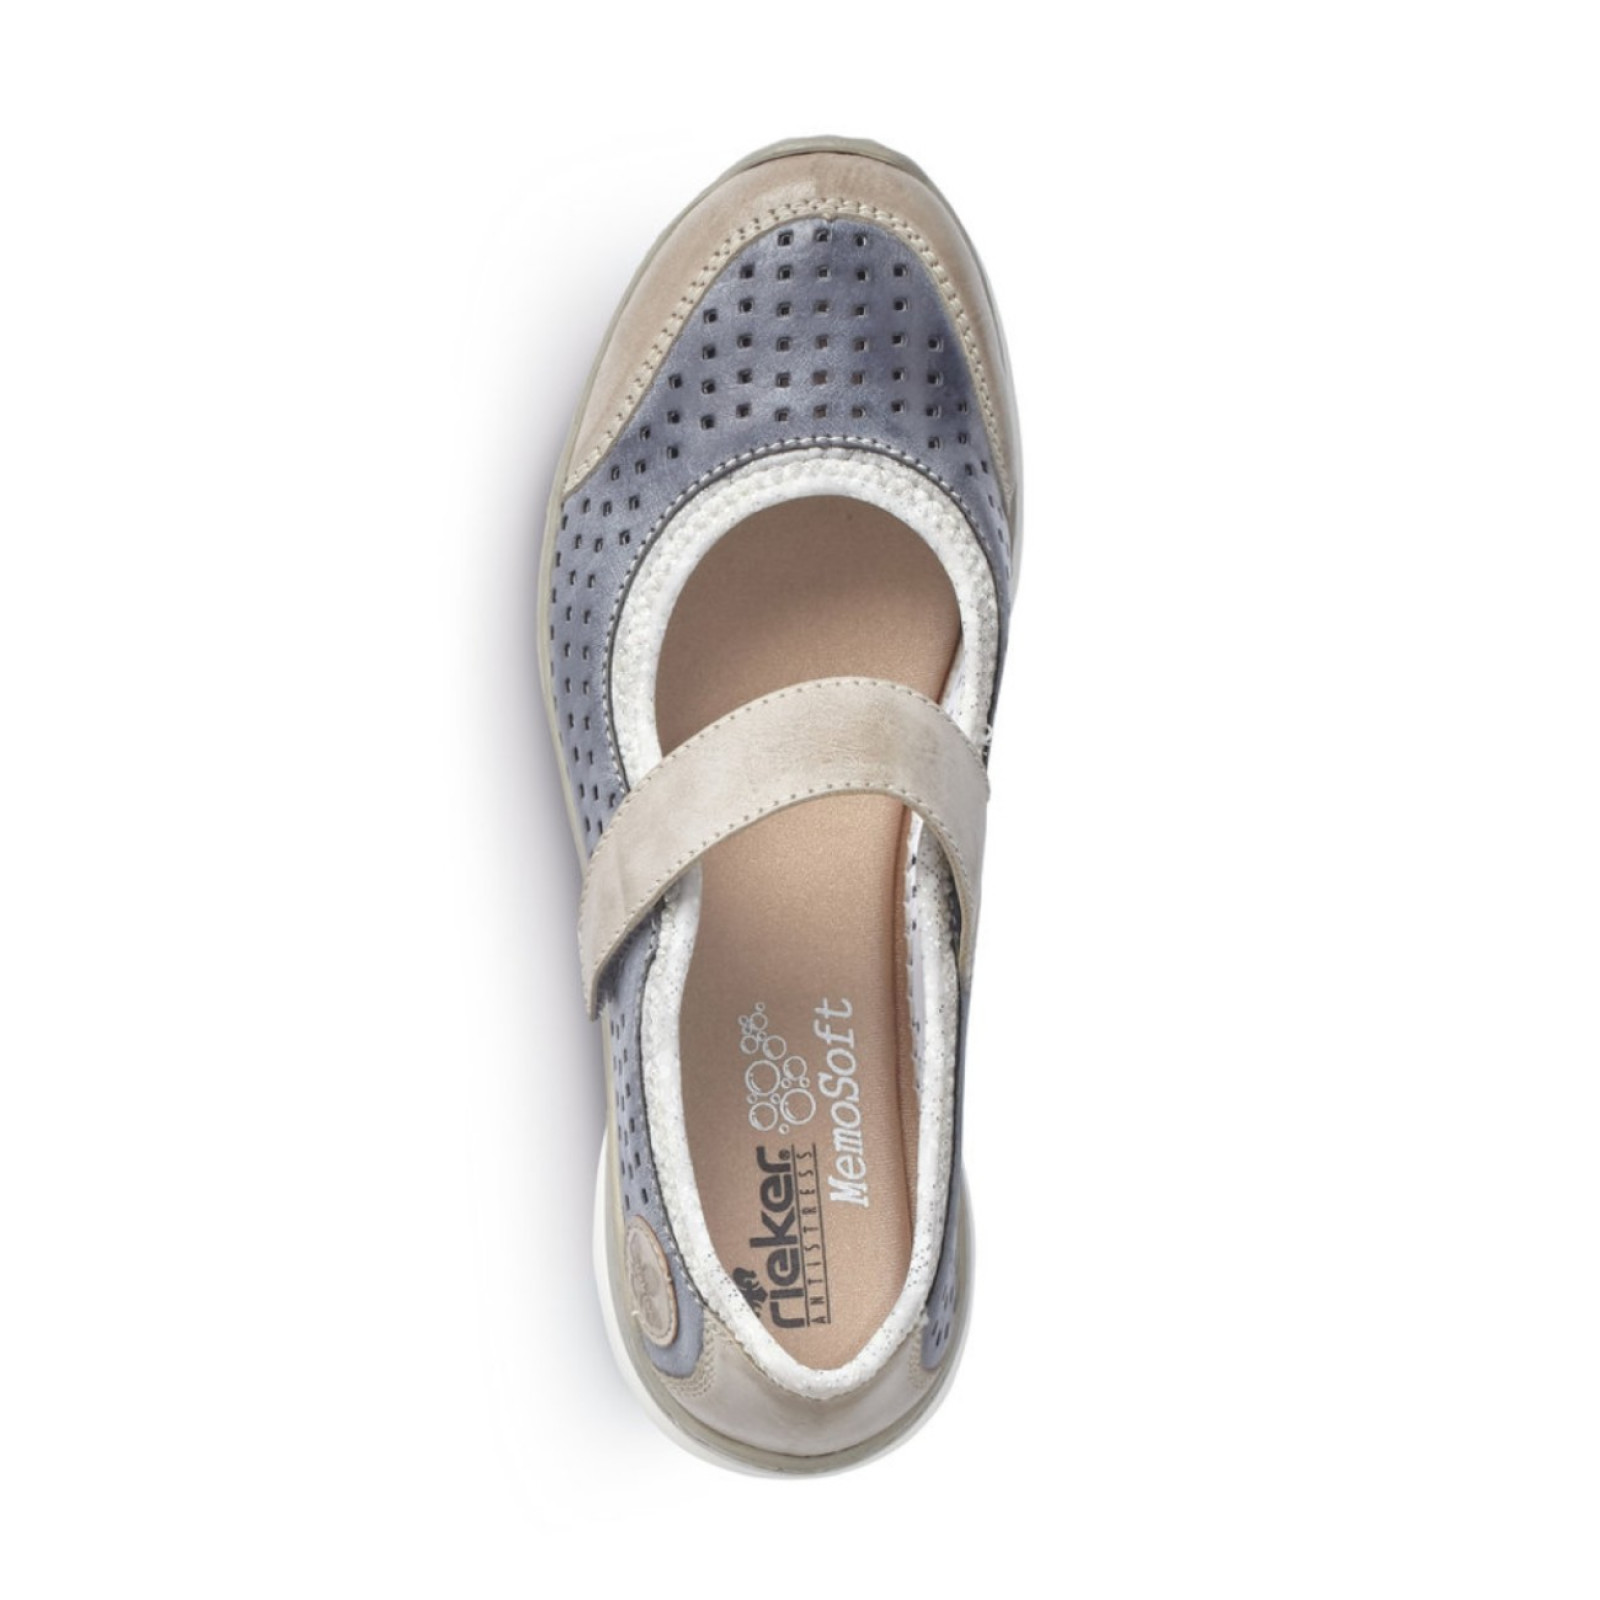 Rieker női pántos balerina cipő 53985